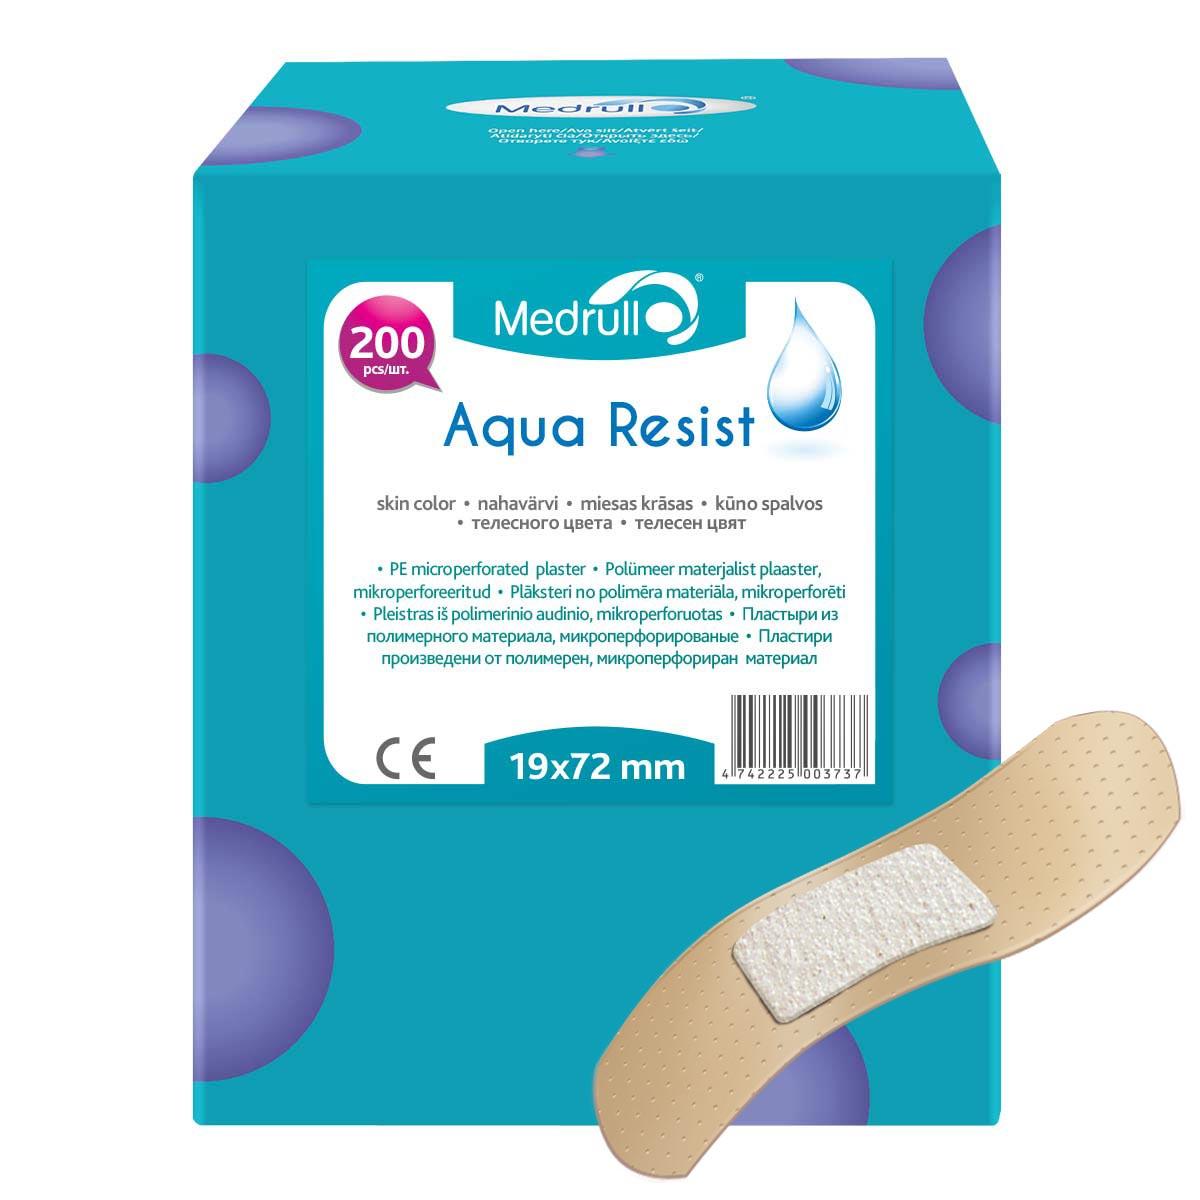 Medrull Набор пластырей  Aqua Resist , 1,9х7,2 см, №200 - Перевязочные материалы